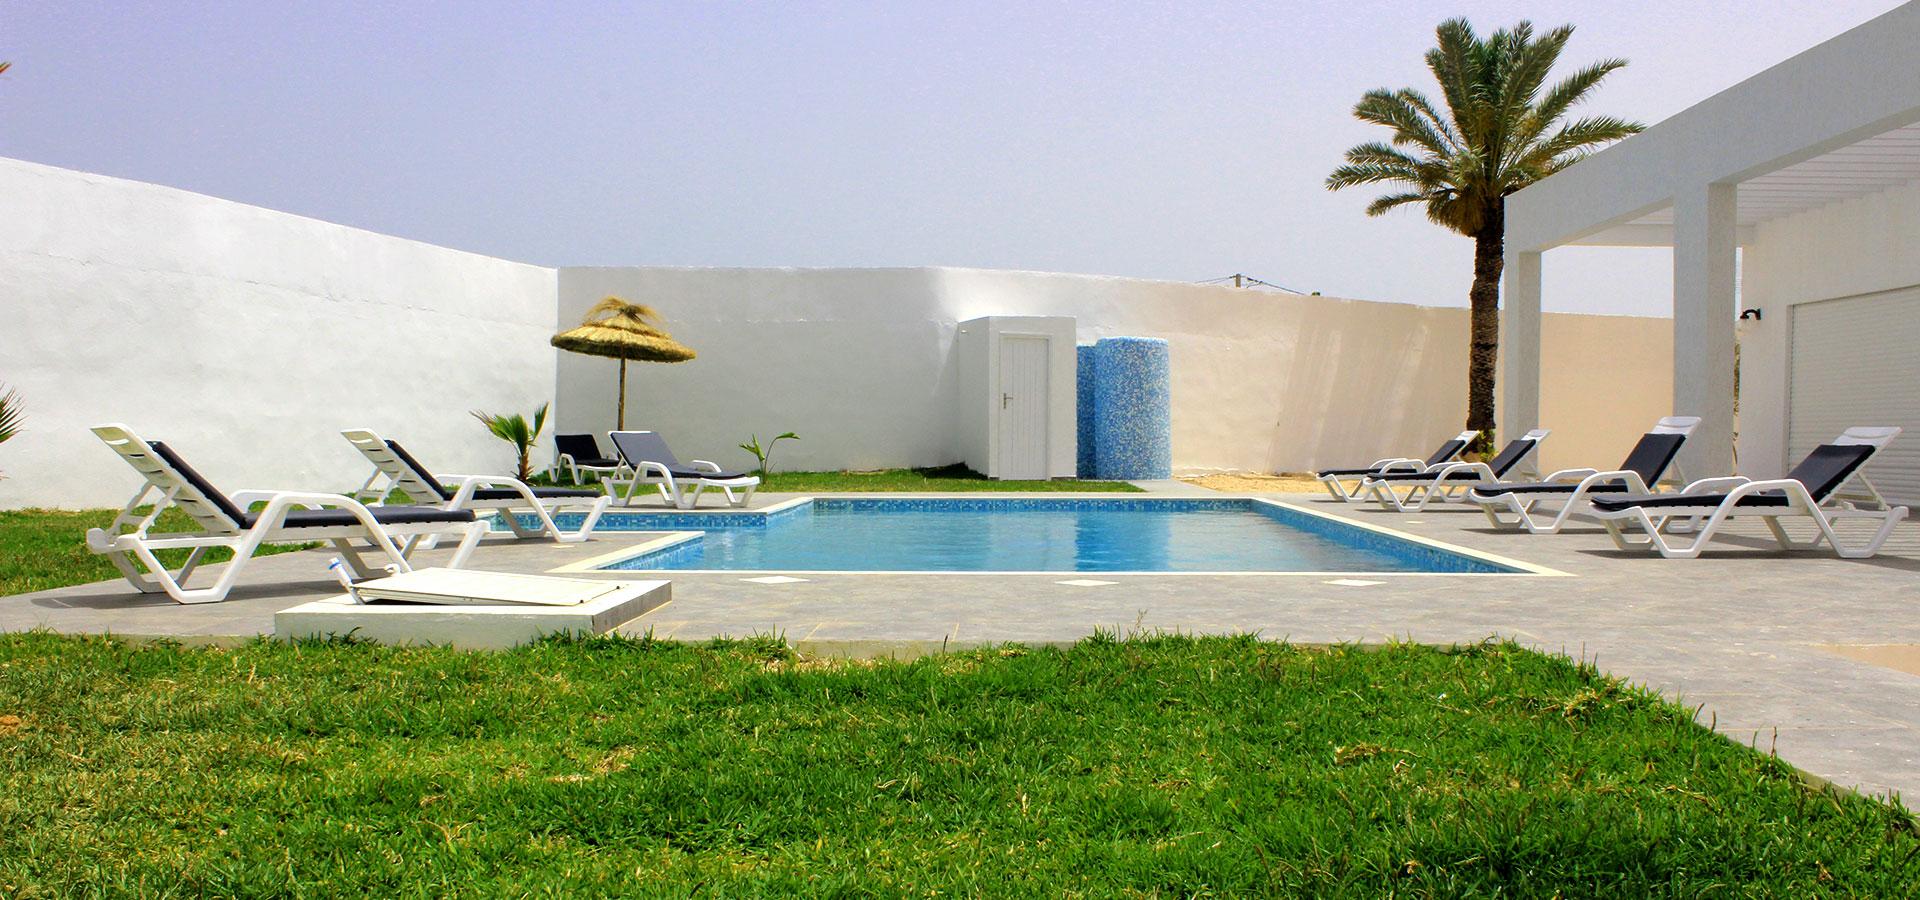 Maison à louer Djerba Tunisie